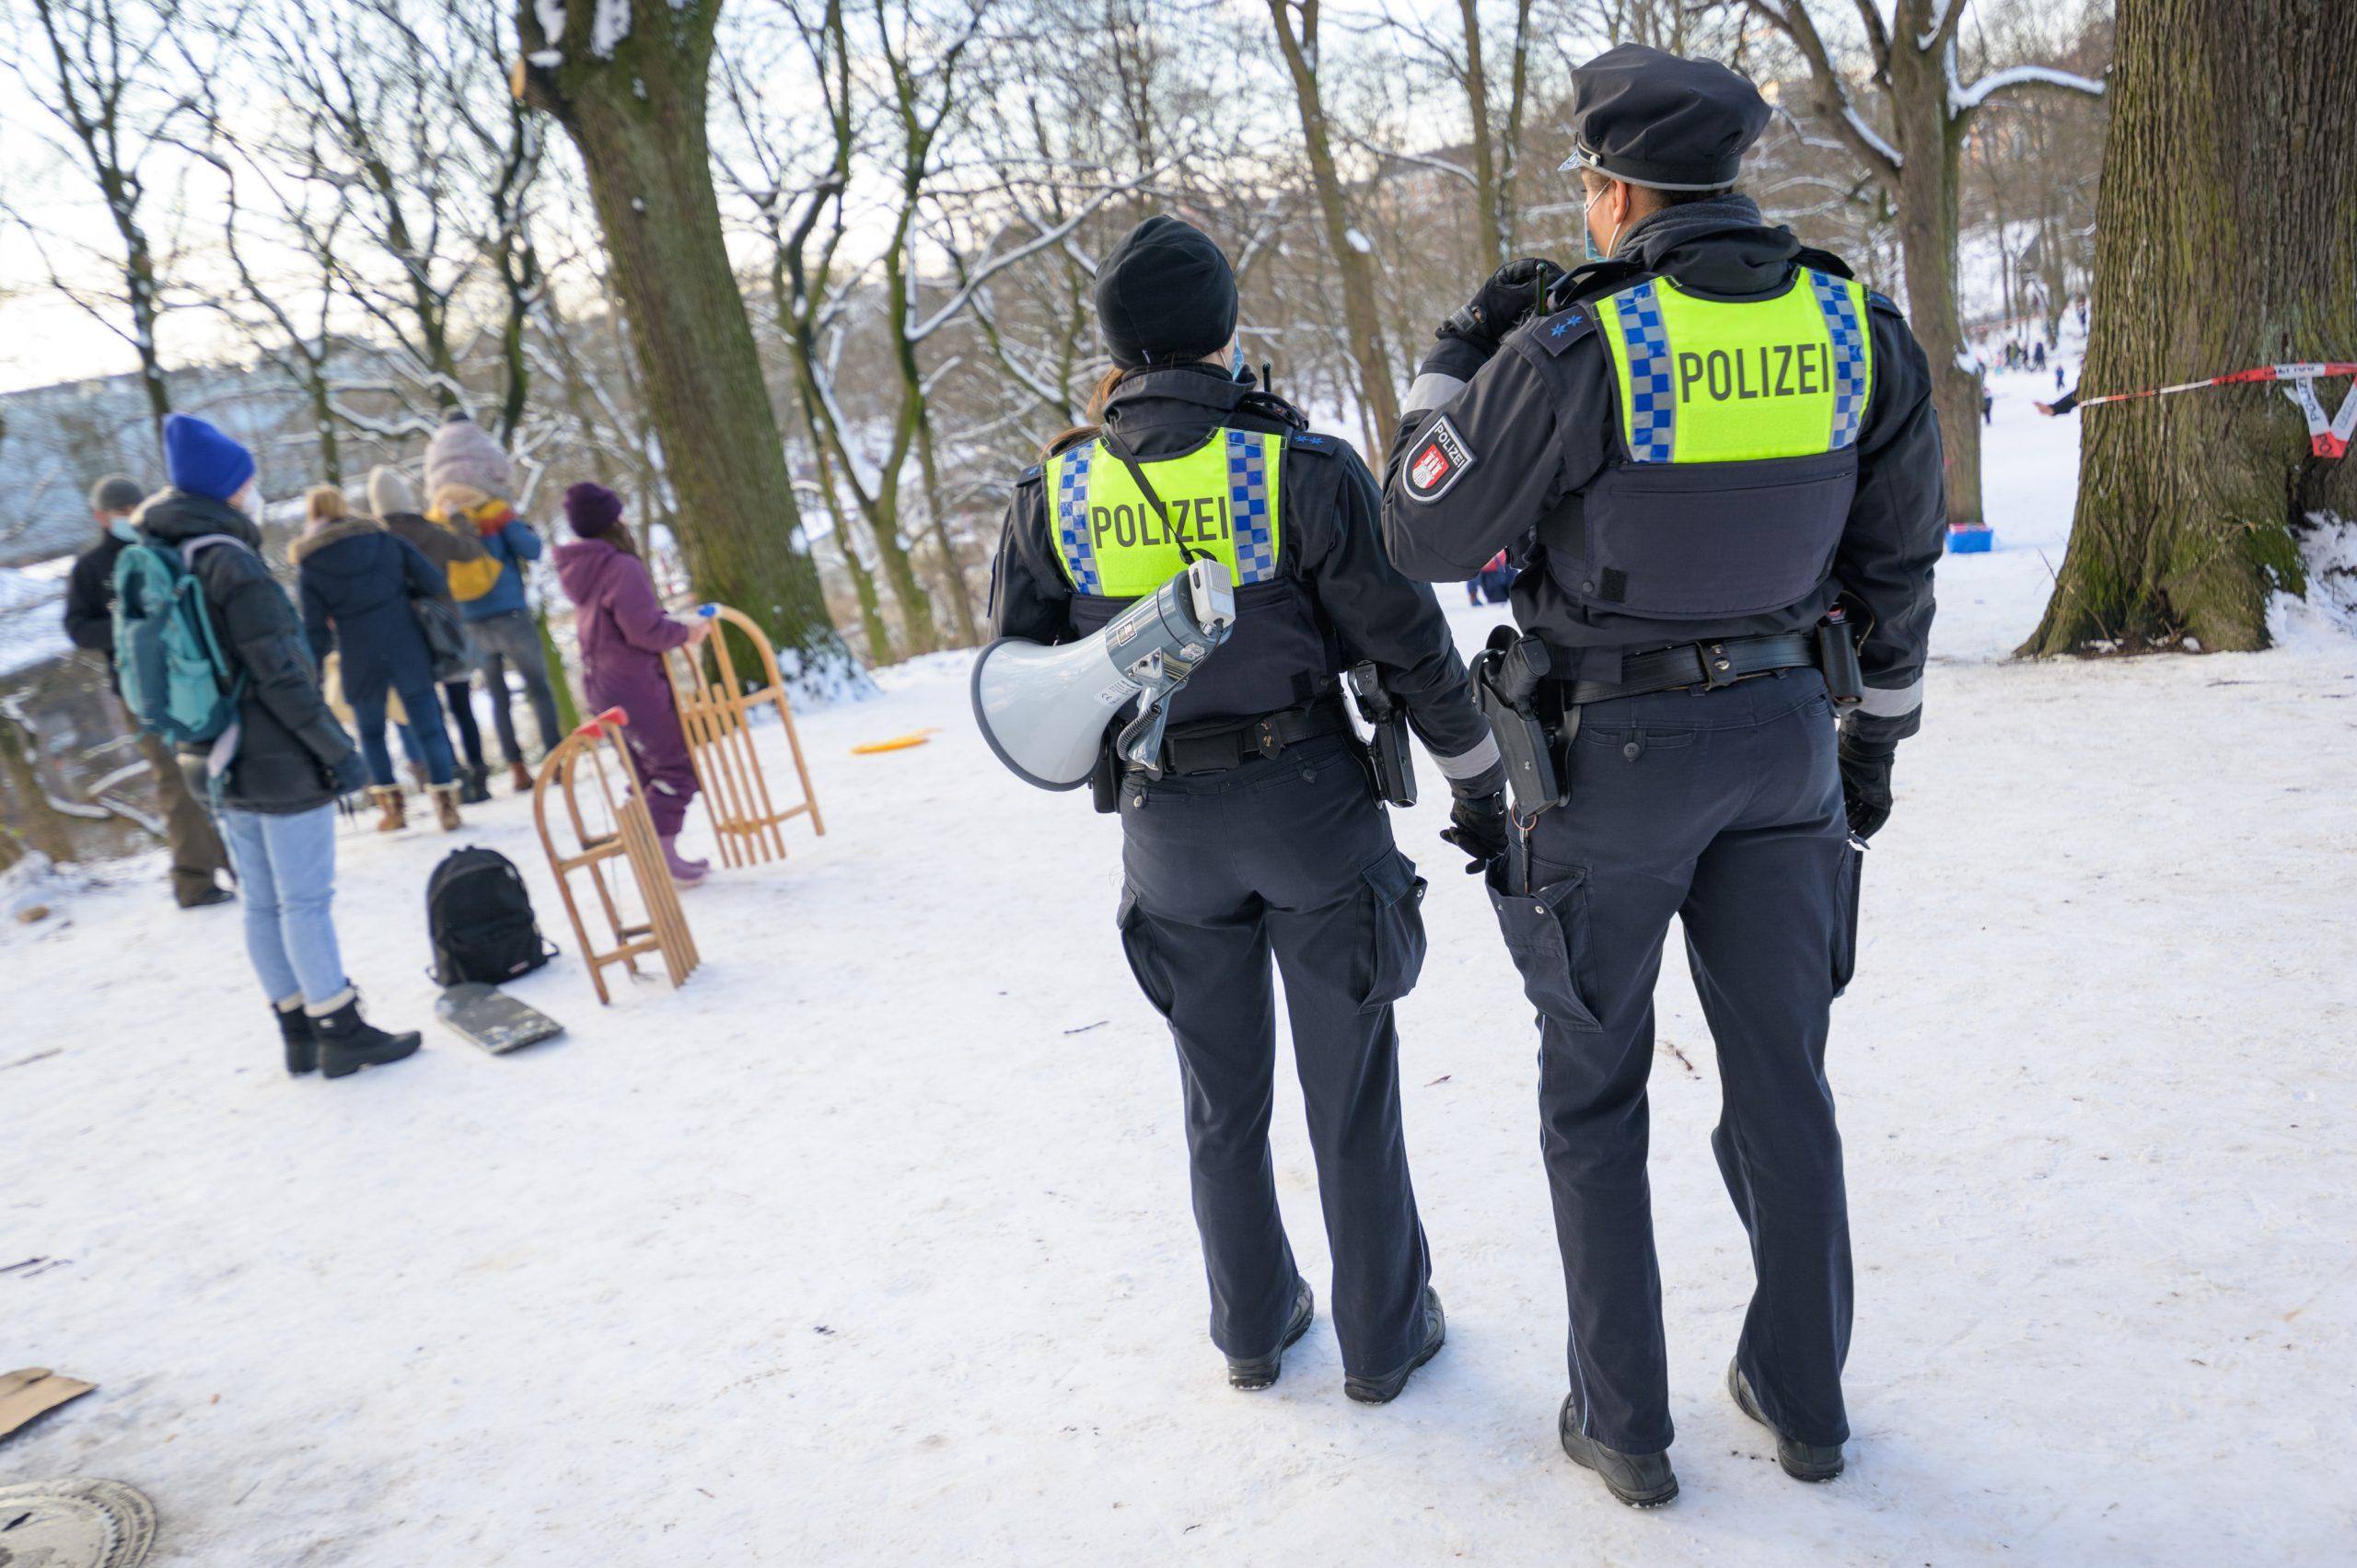 Frierende Polizisten - Gewerkschaft fordert Winterkleidung